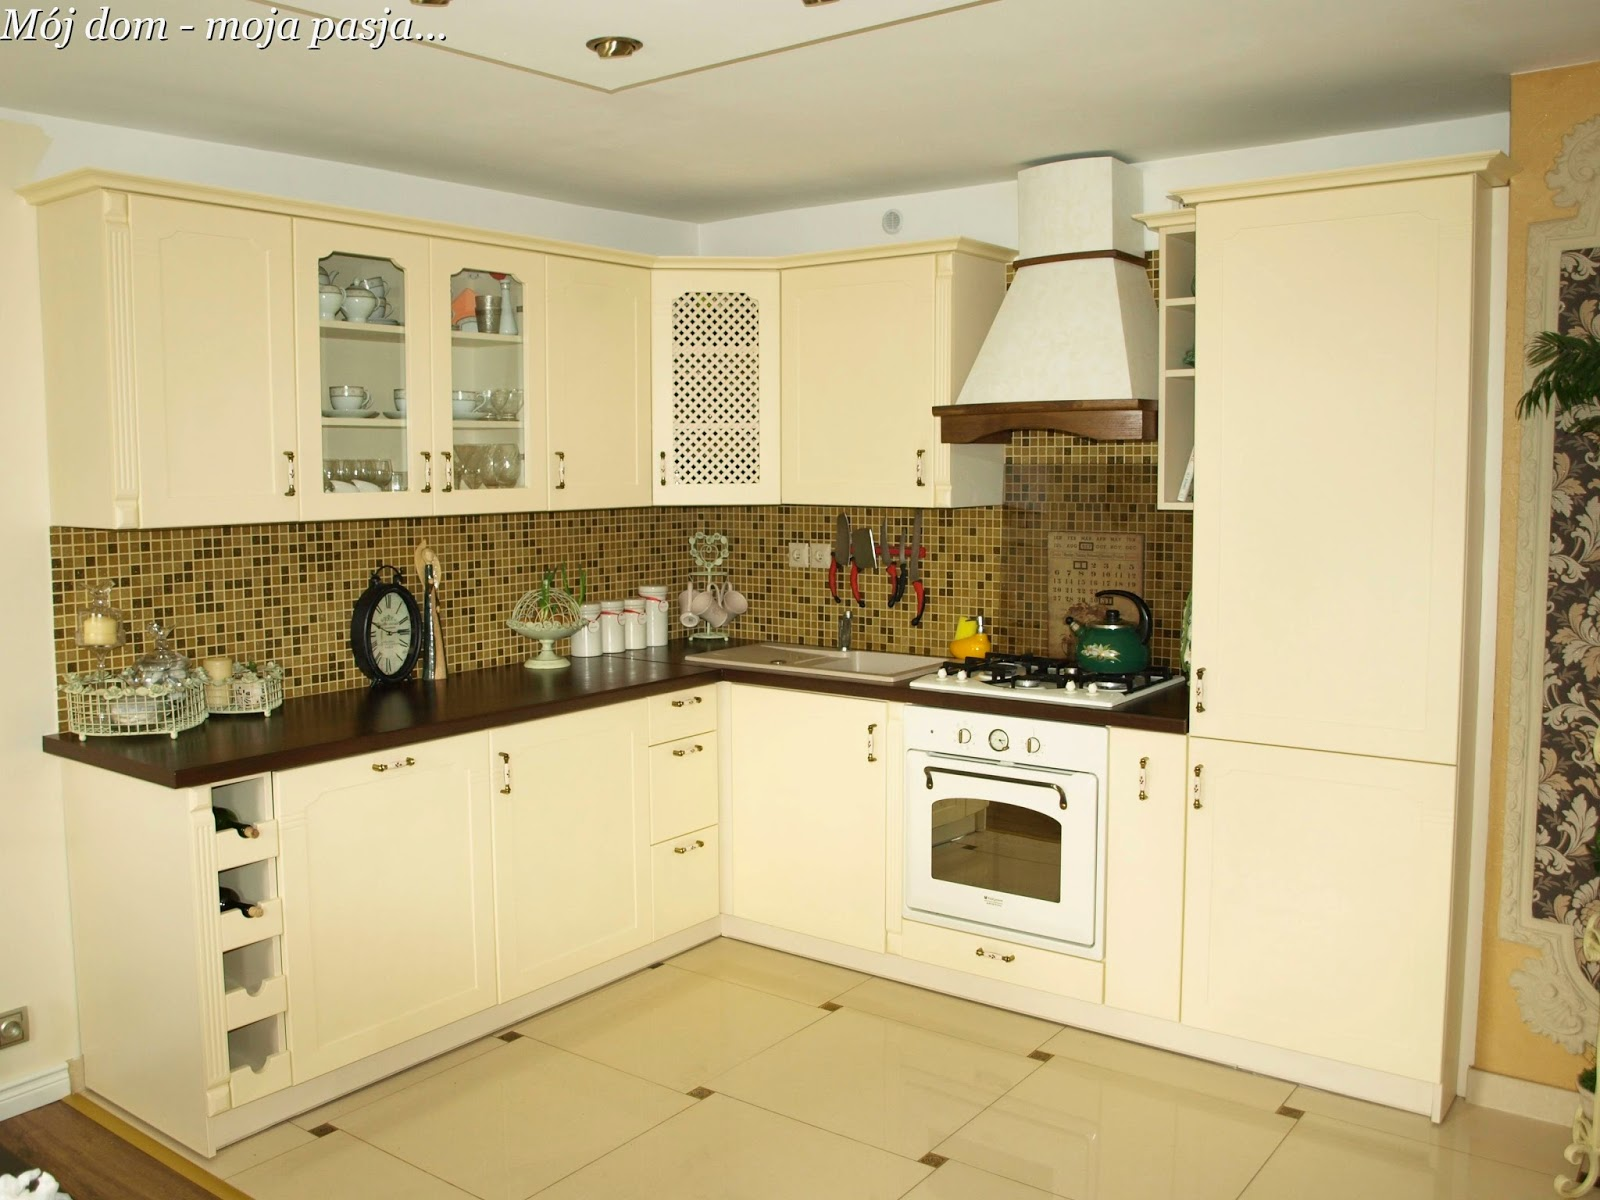 Mój dom  moja pasja by DomiNika maja 2014 -> Kuchnia Retro Amica